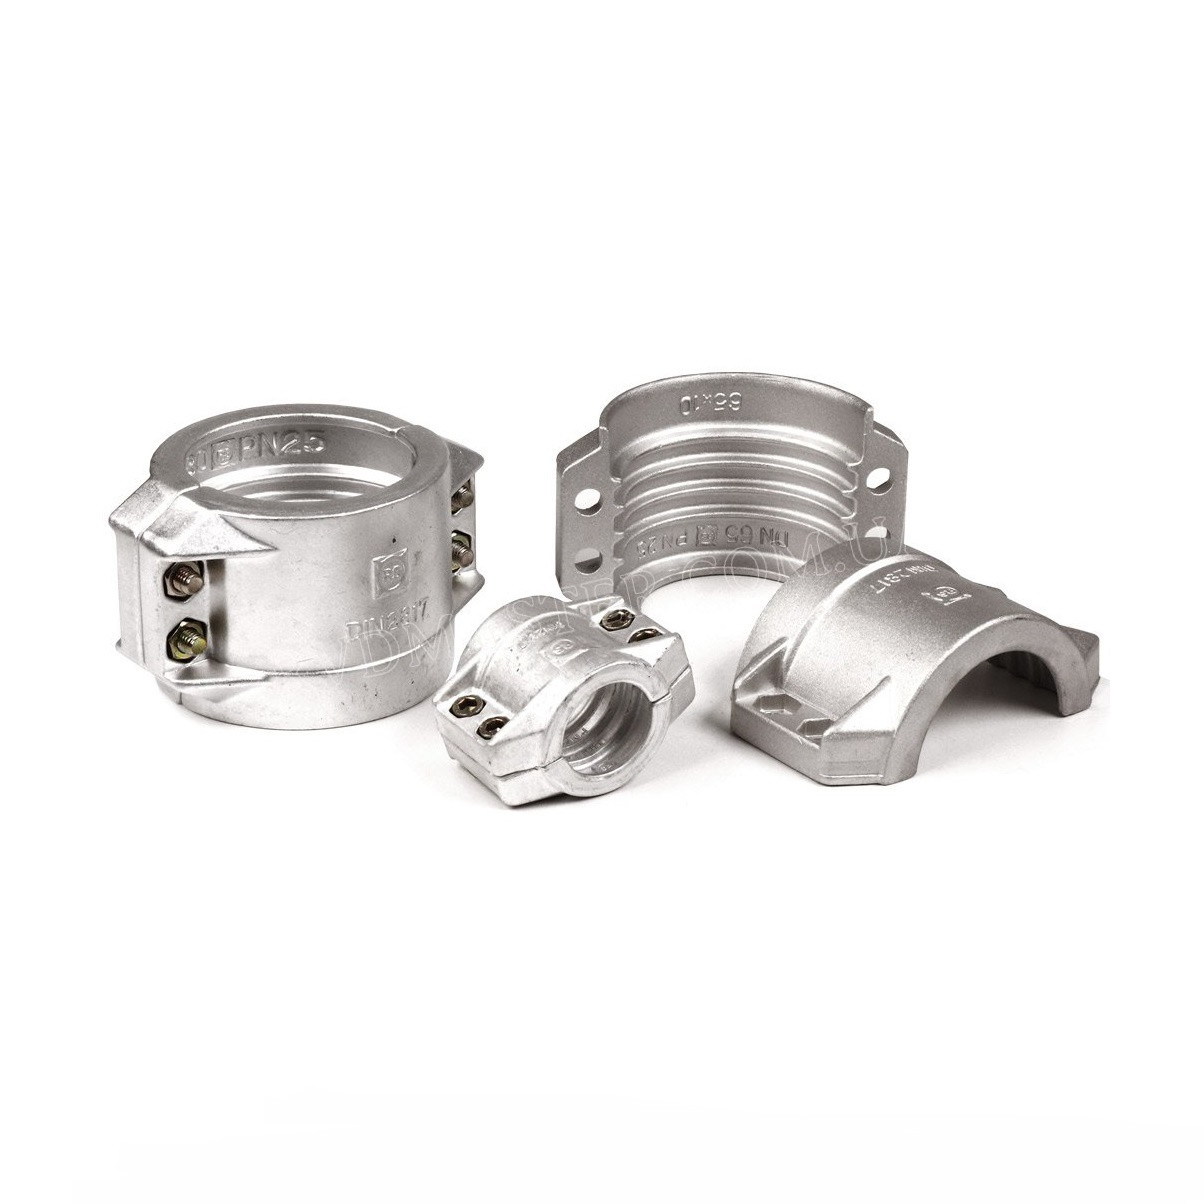 Обойма скорлупчатая, алюминиевая 58-61мм DIN 2817 (рукав 50х5)